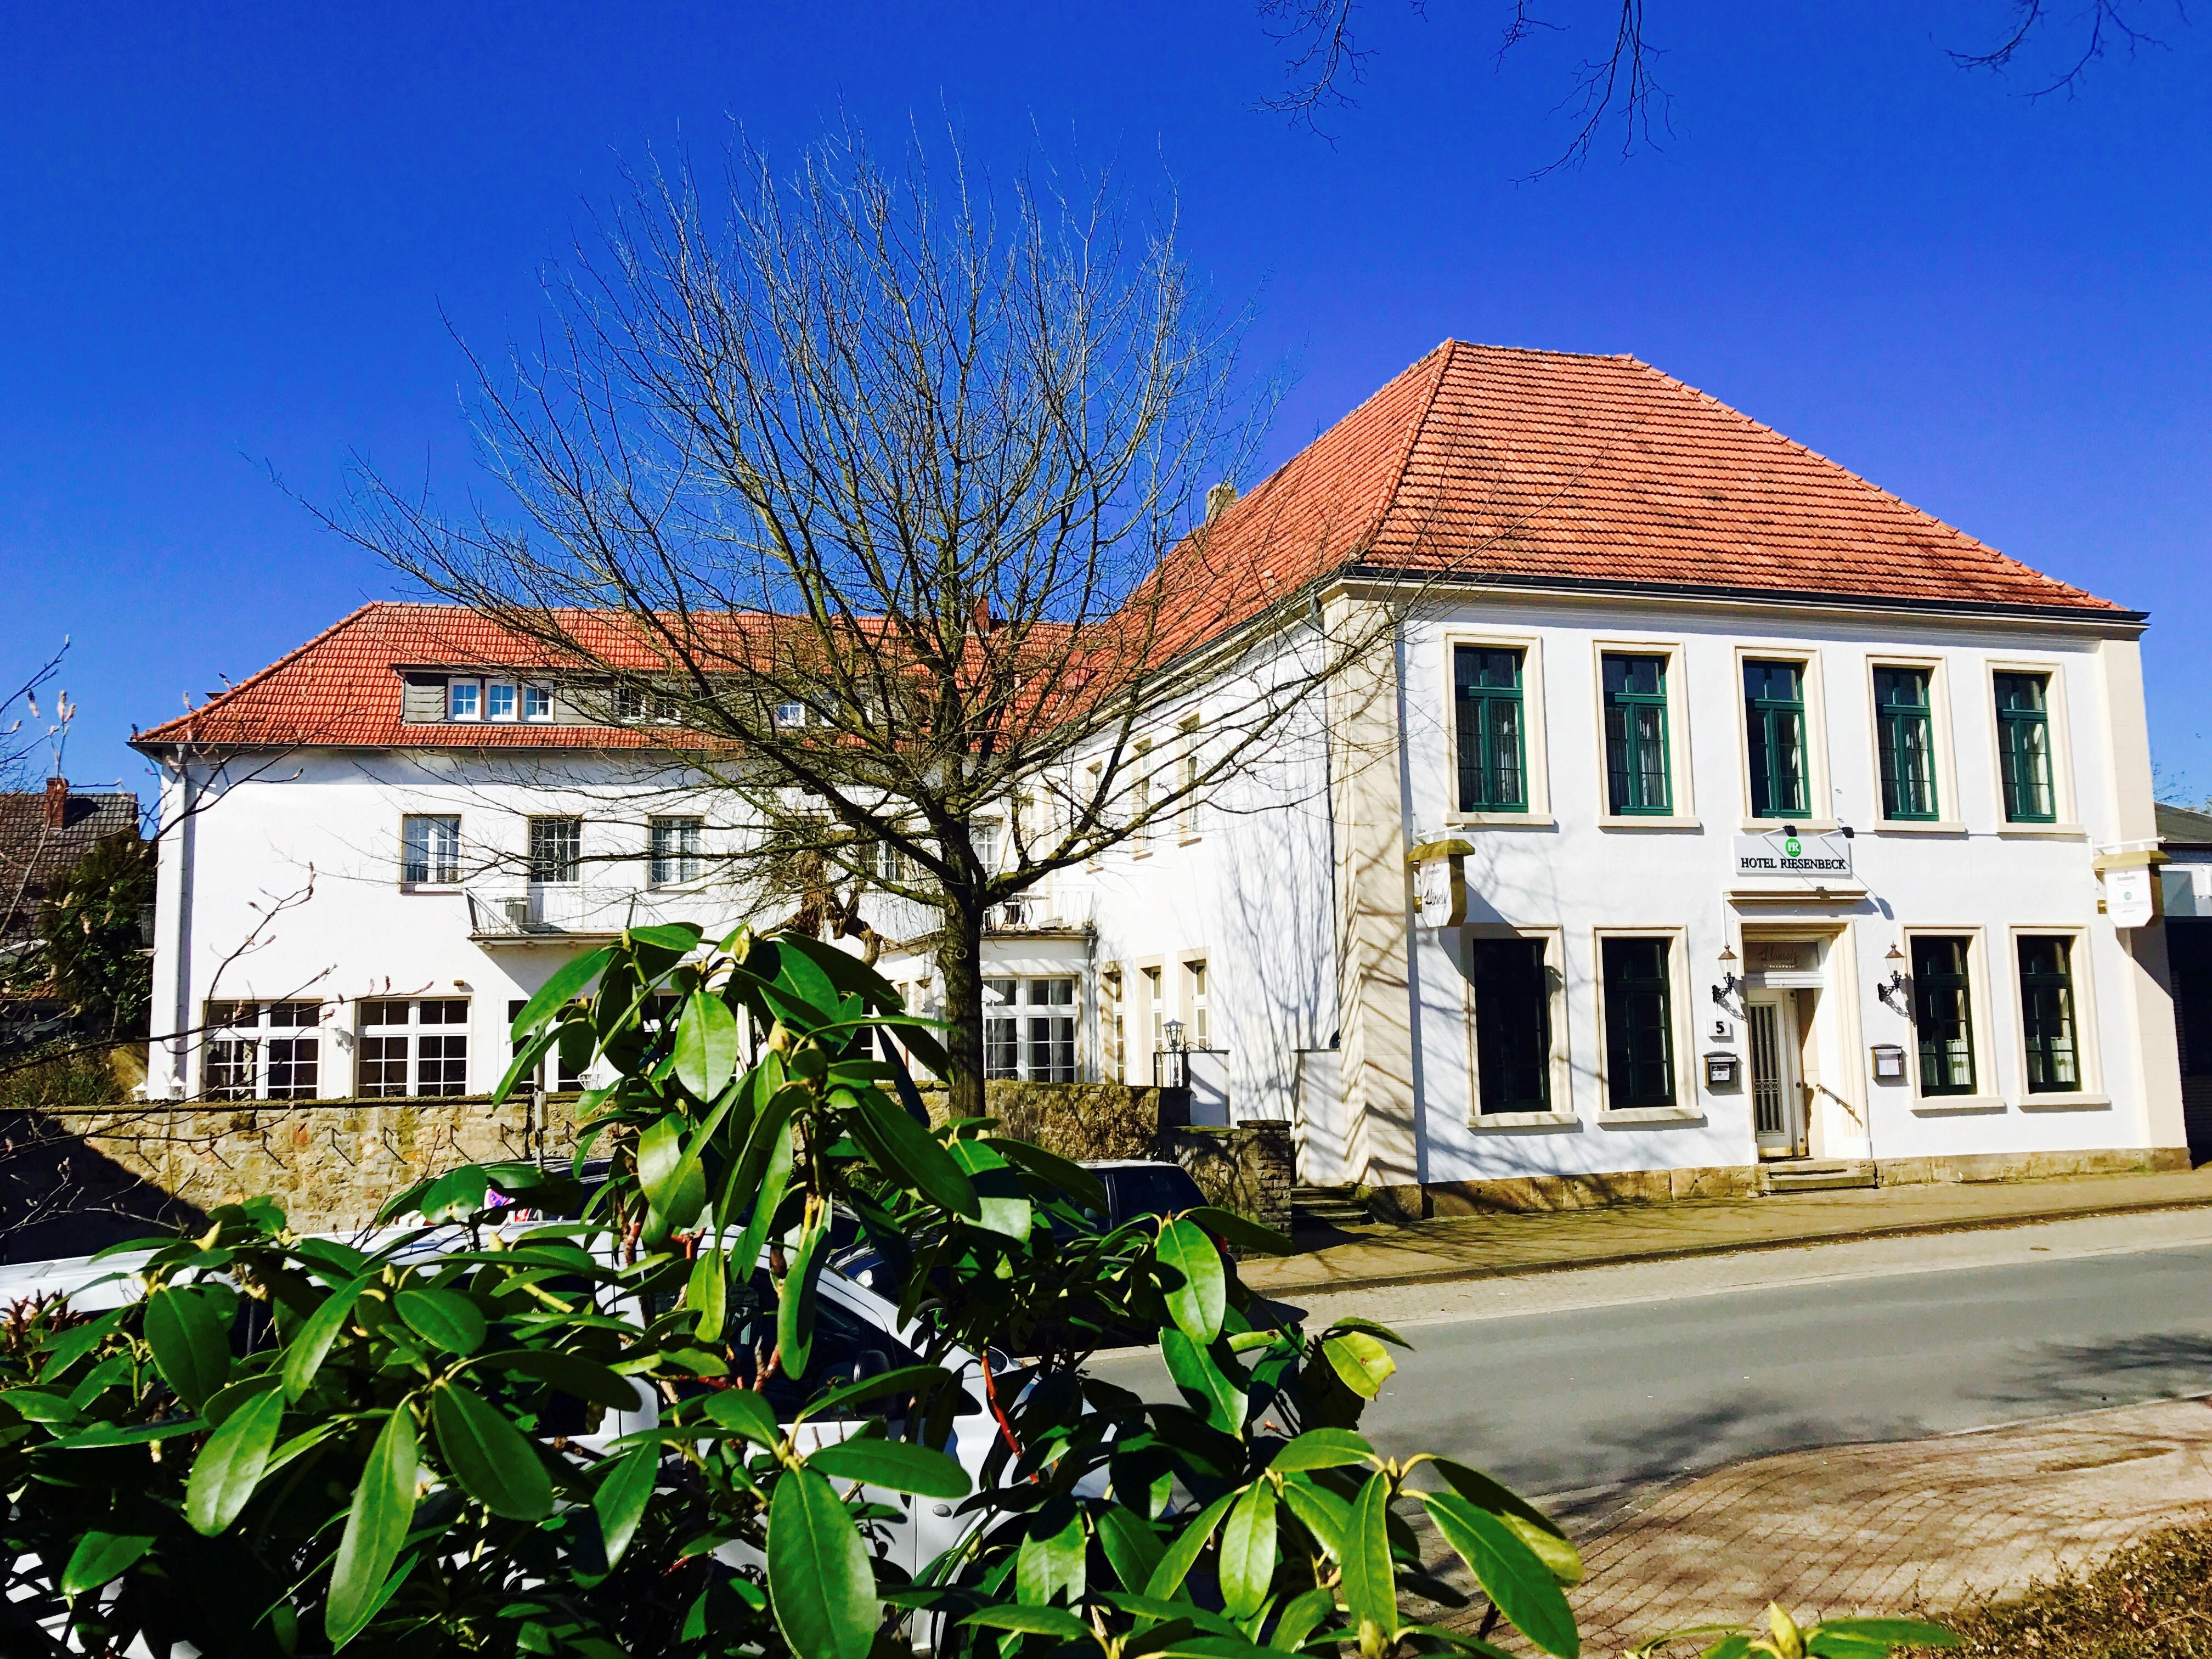 The Hotel Riesenbeck